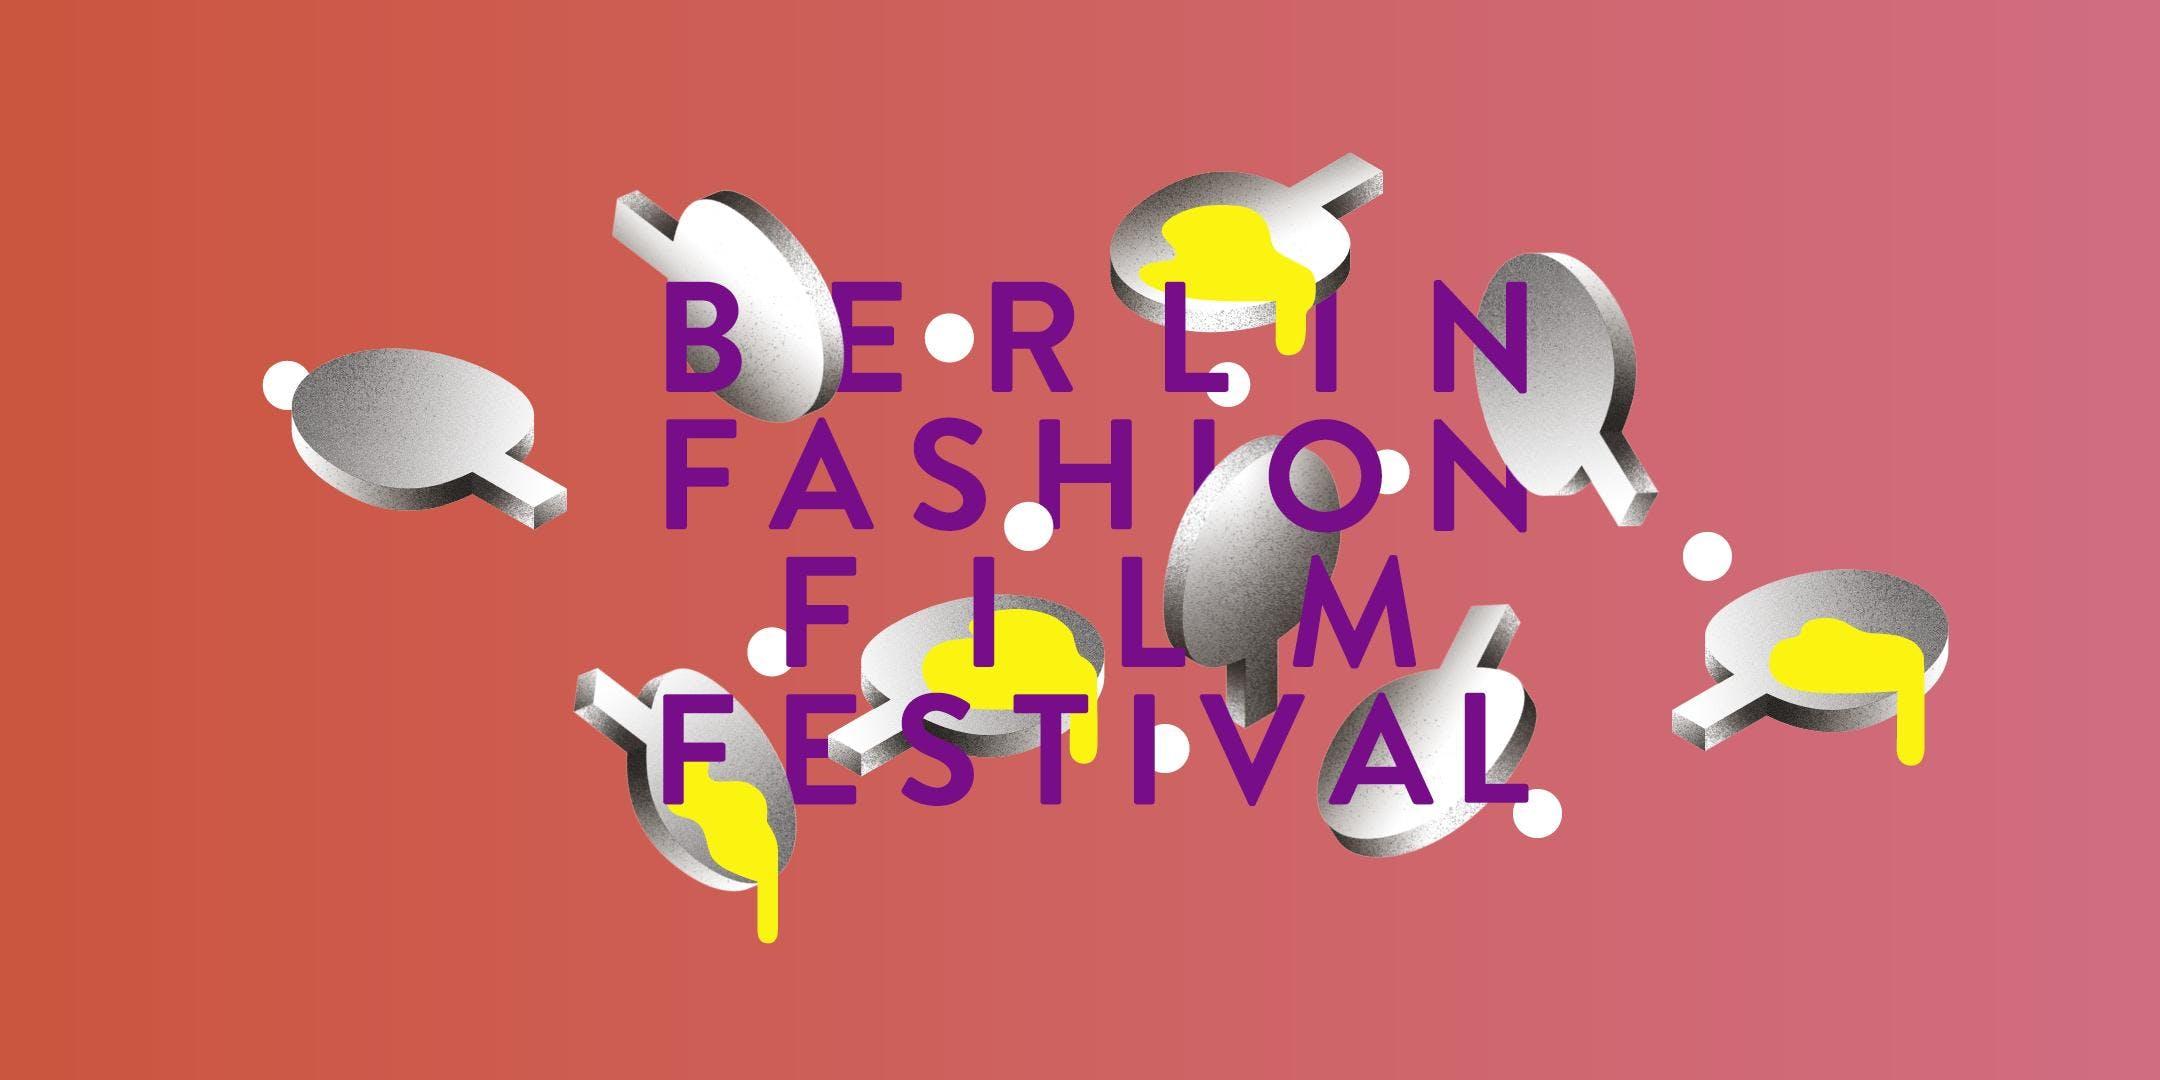 Berlin Fashion Film Festival 2017 // Summit and Awards Show